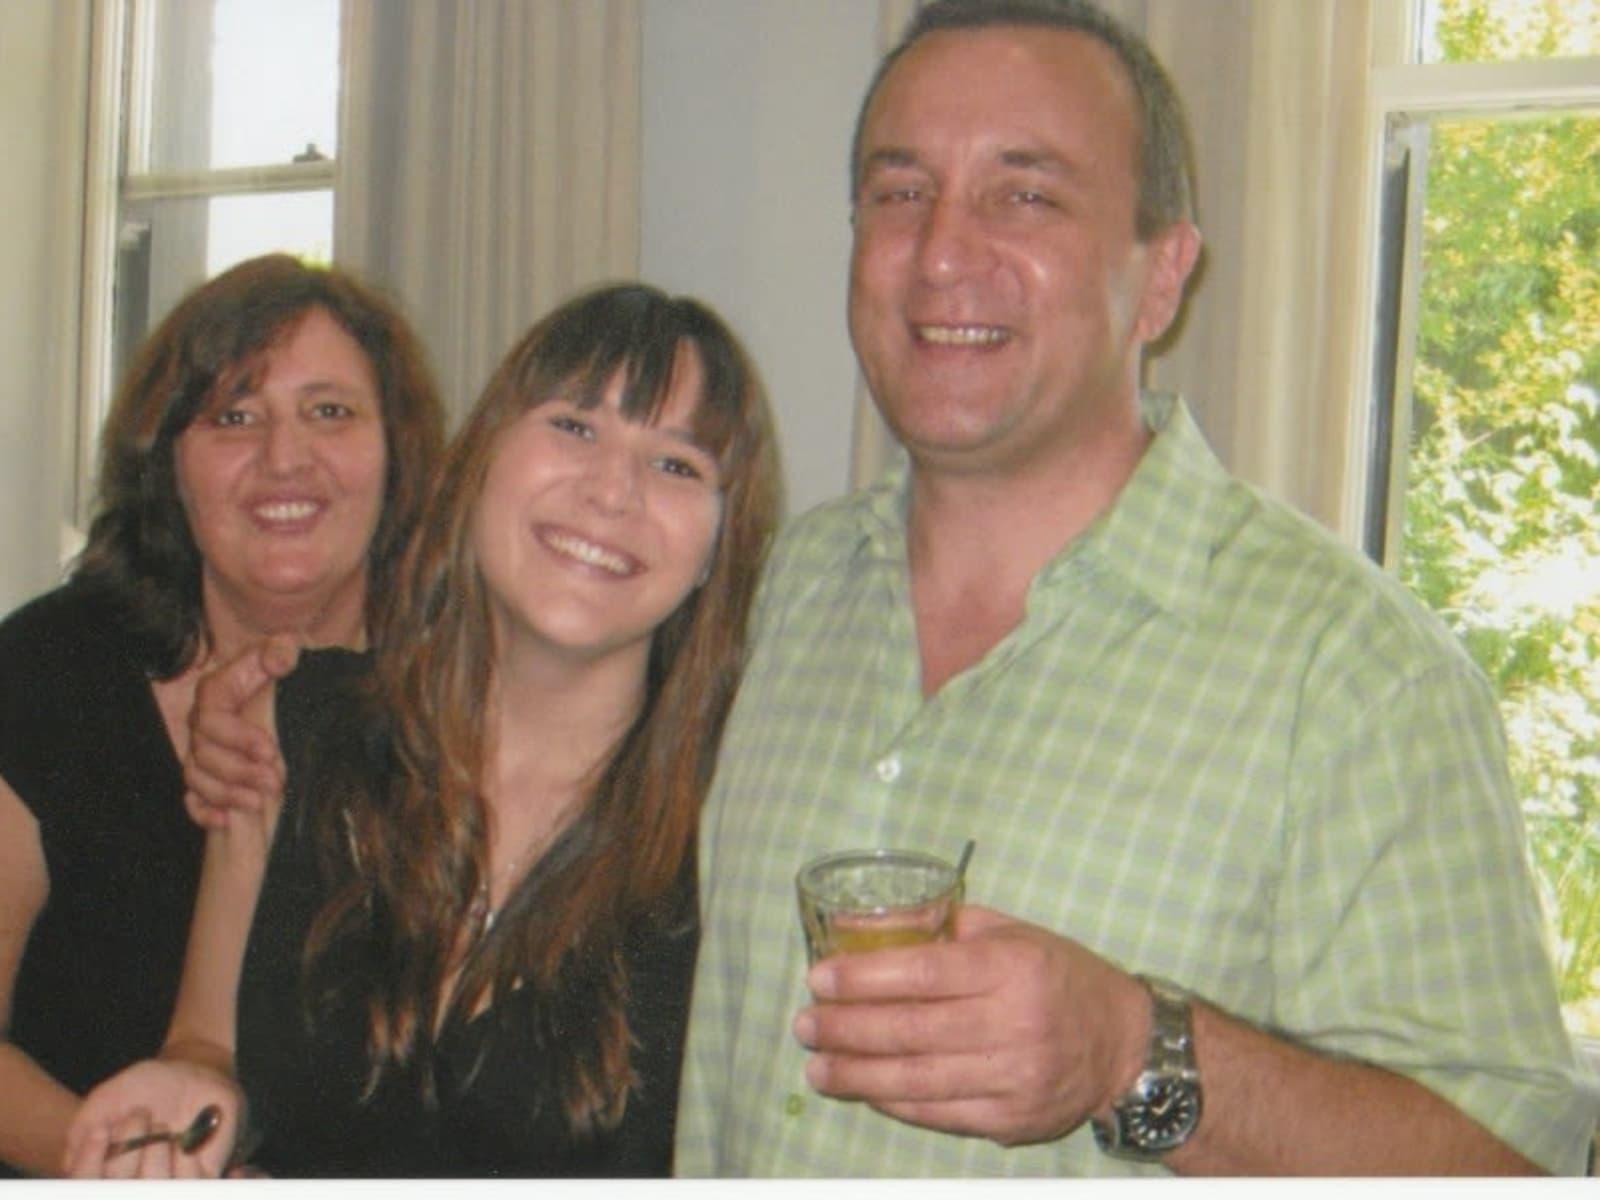 Bill & Yvonne from Perth, Western Australia, Australia